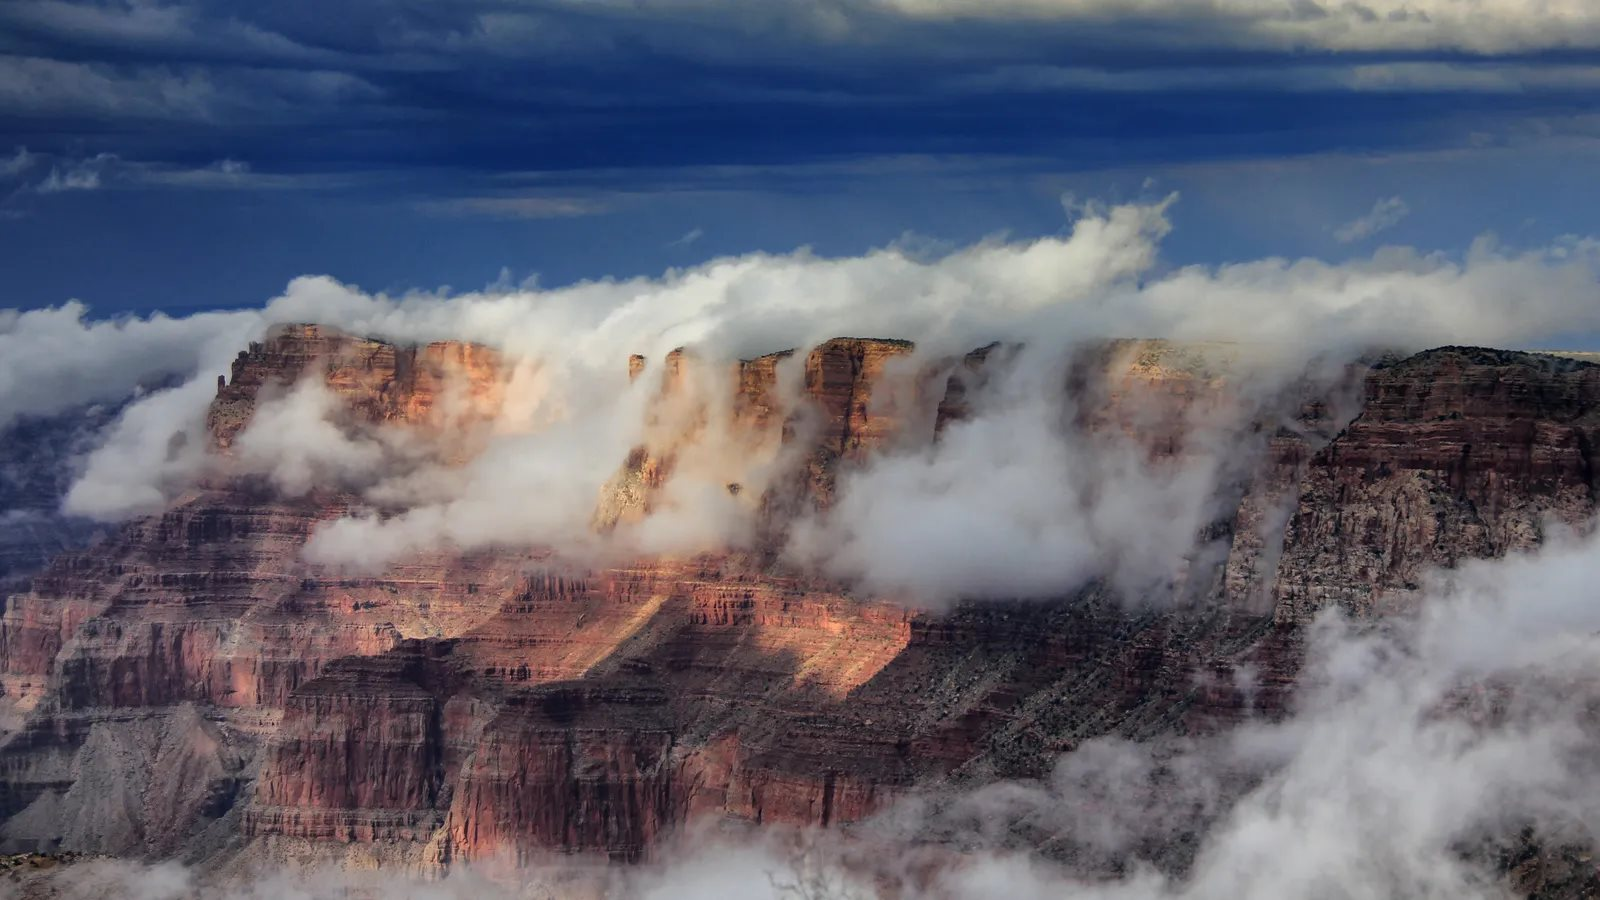 雲霧繚繞的科羅拉多大峽谷(Credit: Getty Images)